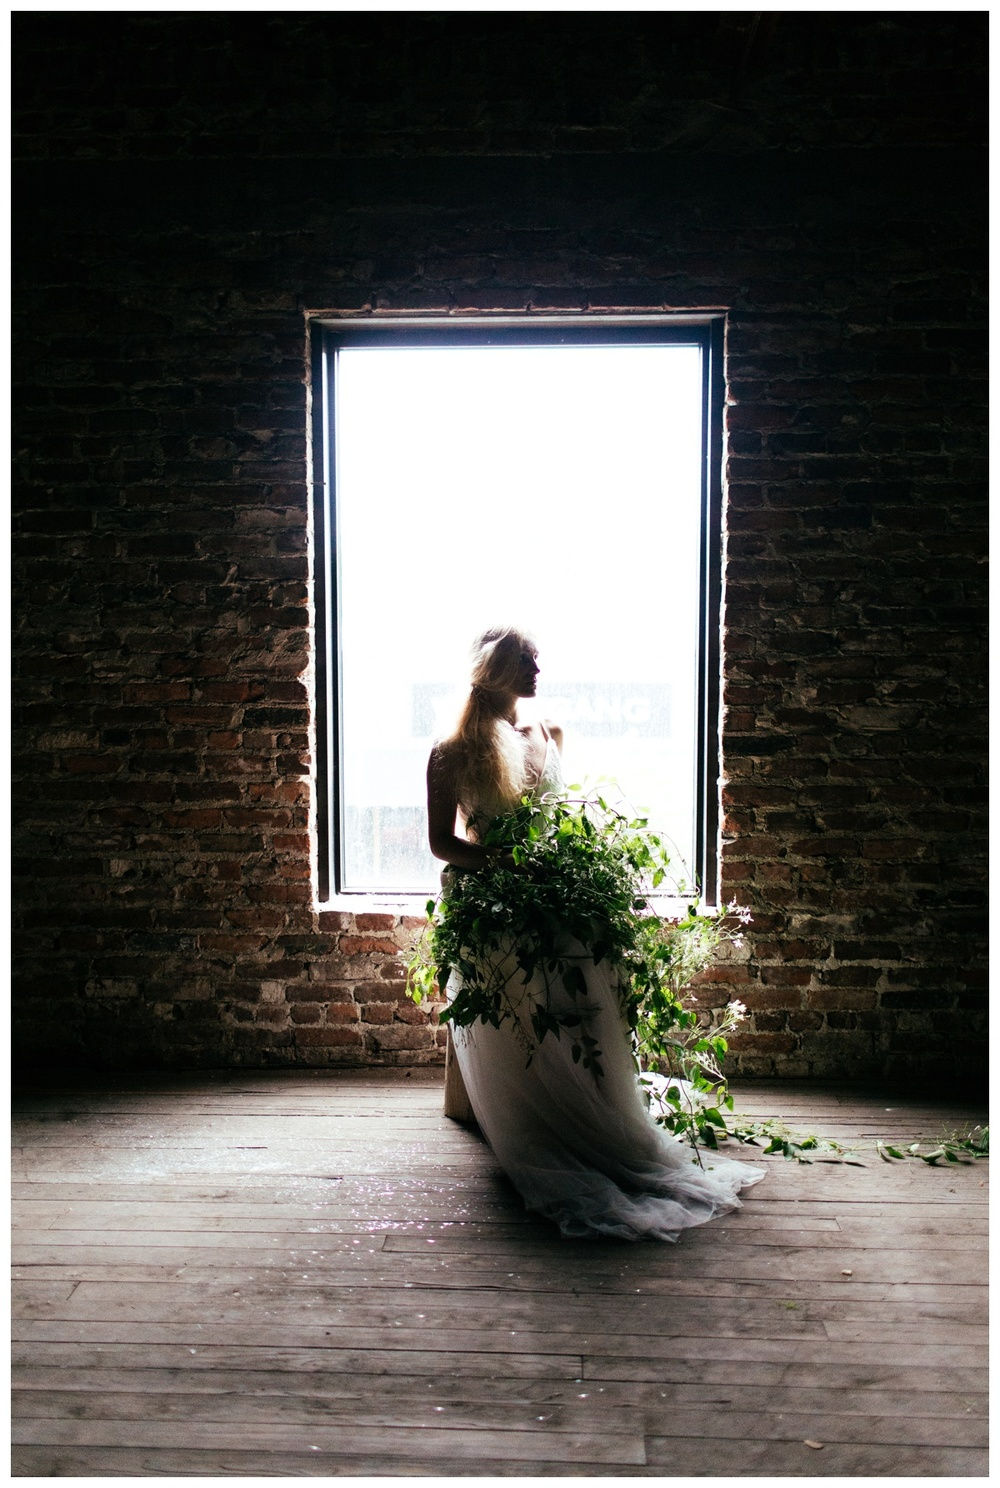 jacksonvillewarehousewedding.jpg